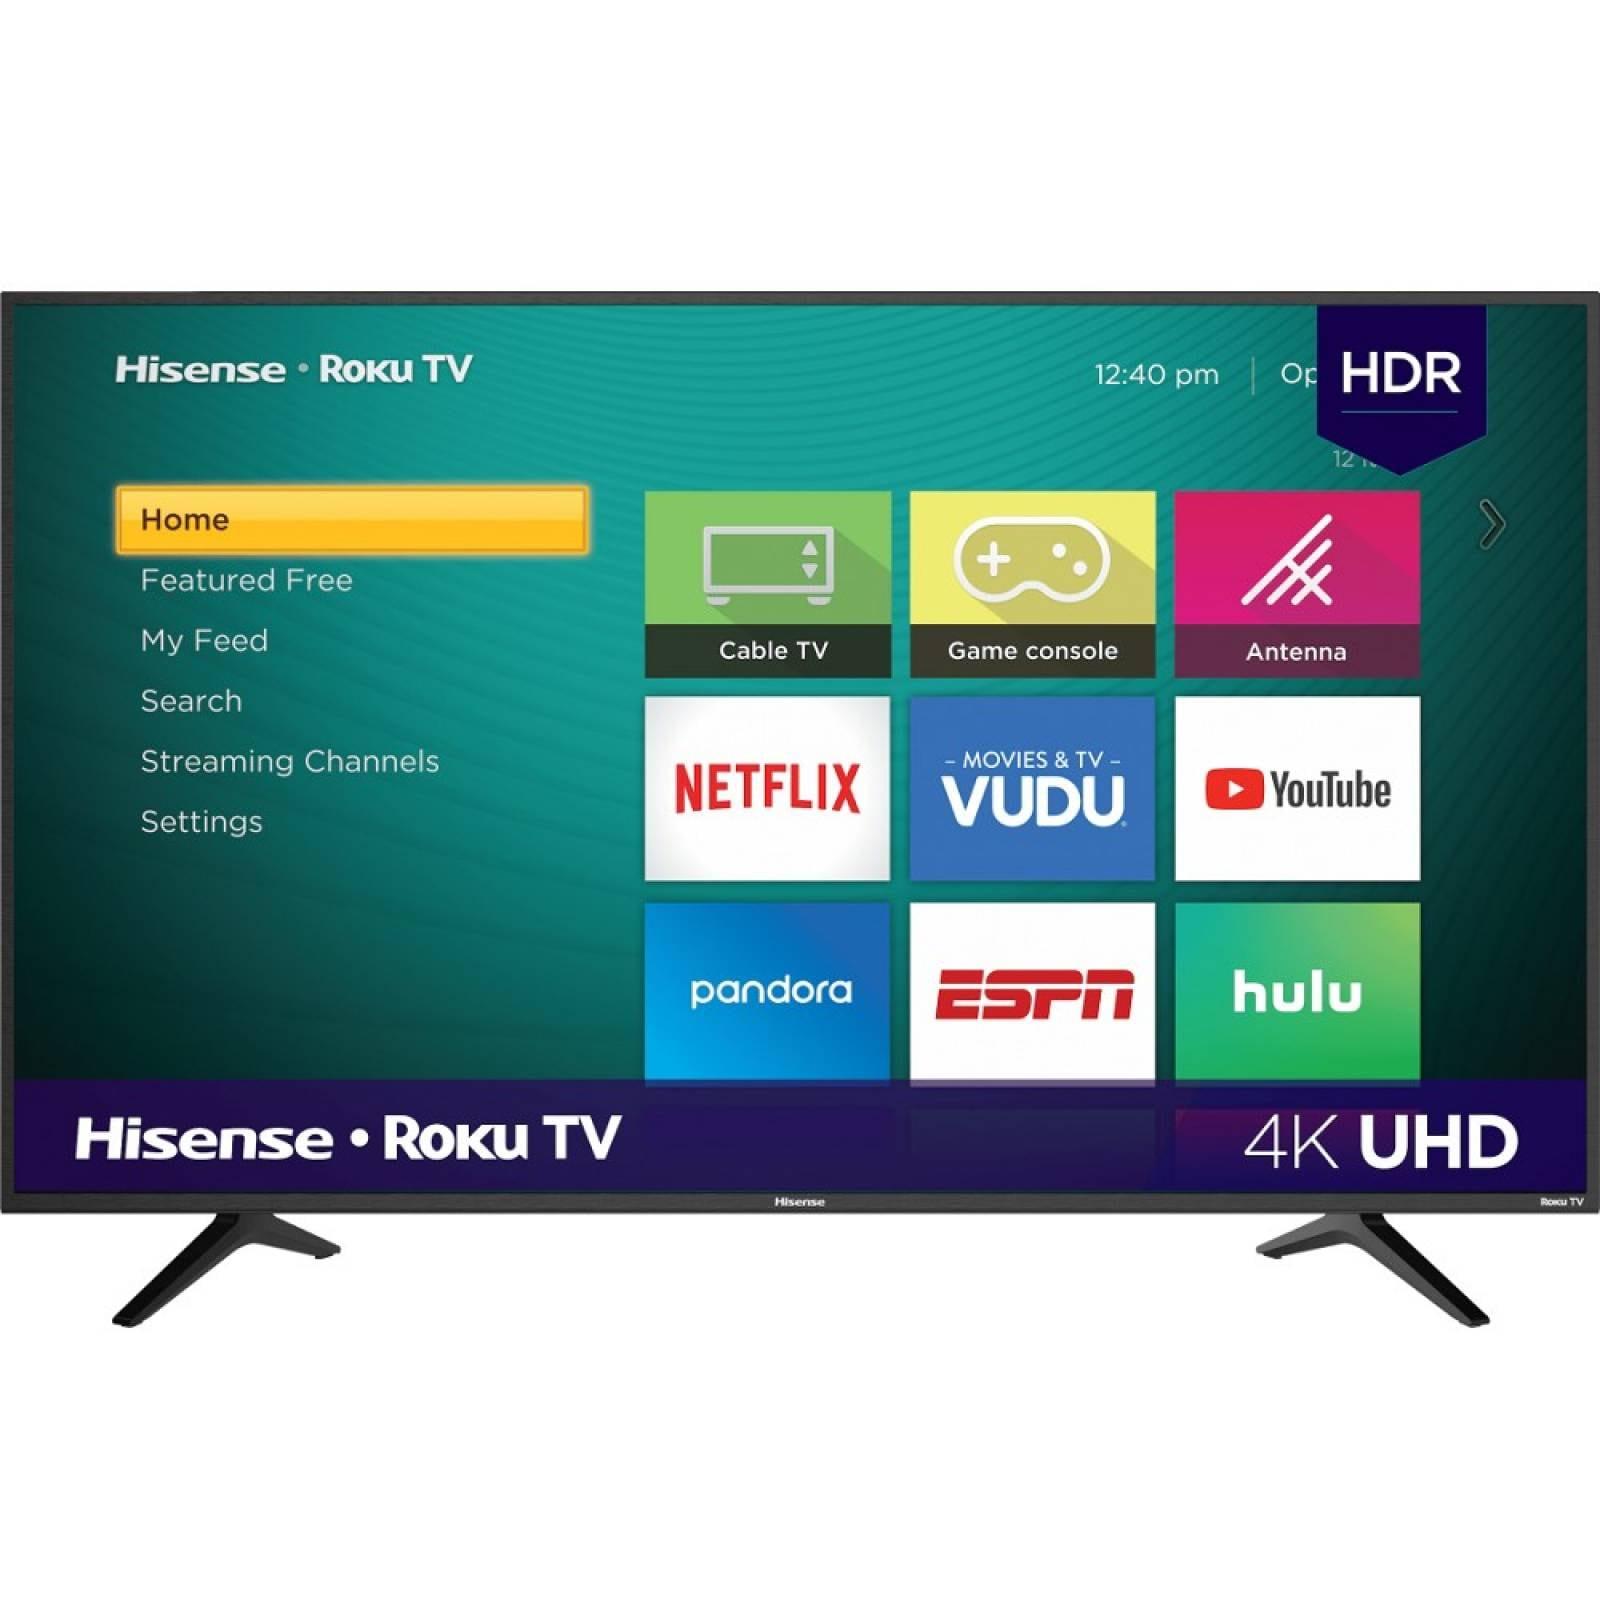 Smart TV 58 Hisense LED Roku TV HDMI 4K upscaler 58R6E - Reacondiciona